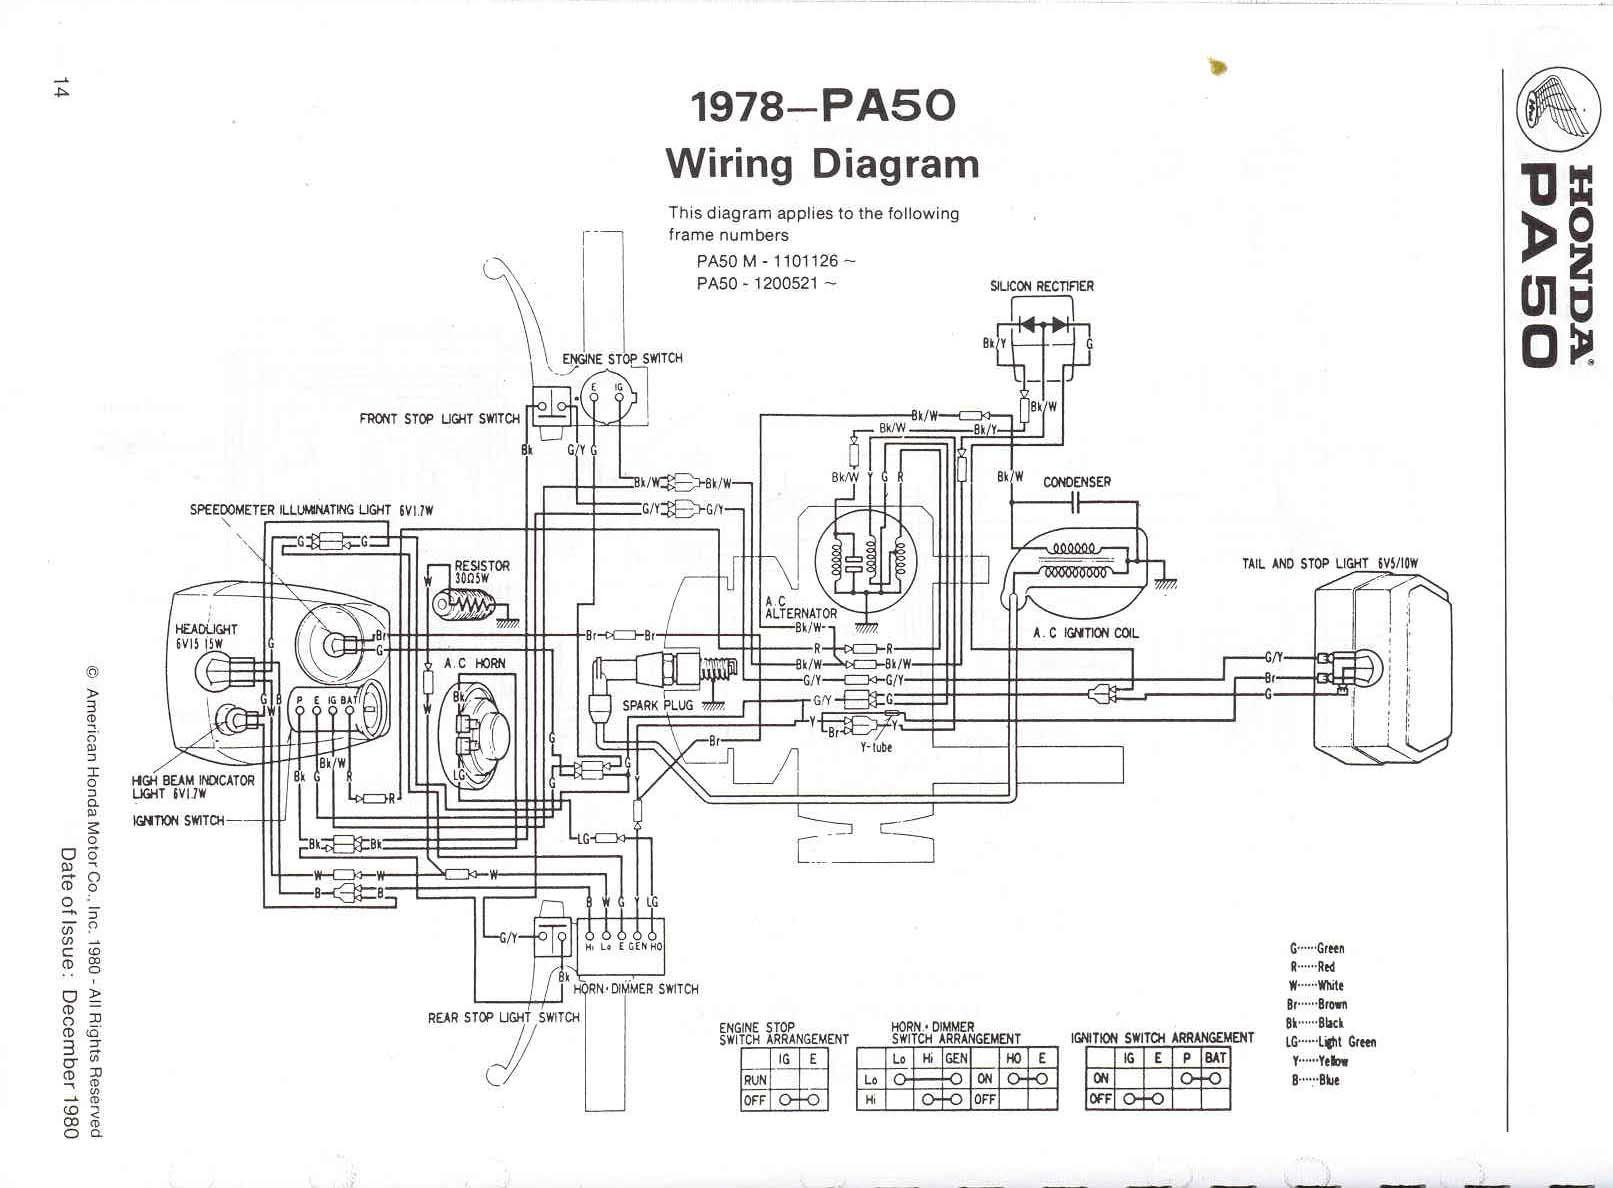 1981 Honda Express Wiring Diagram Wiring Diagram Appearance A Appearance A Saleebalocchi It